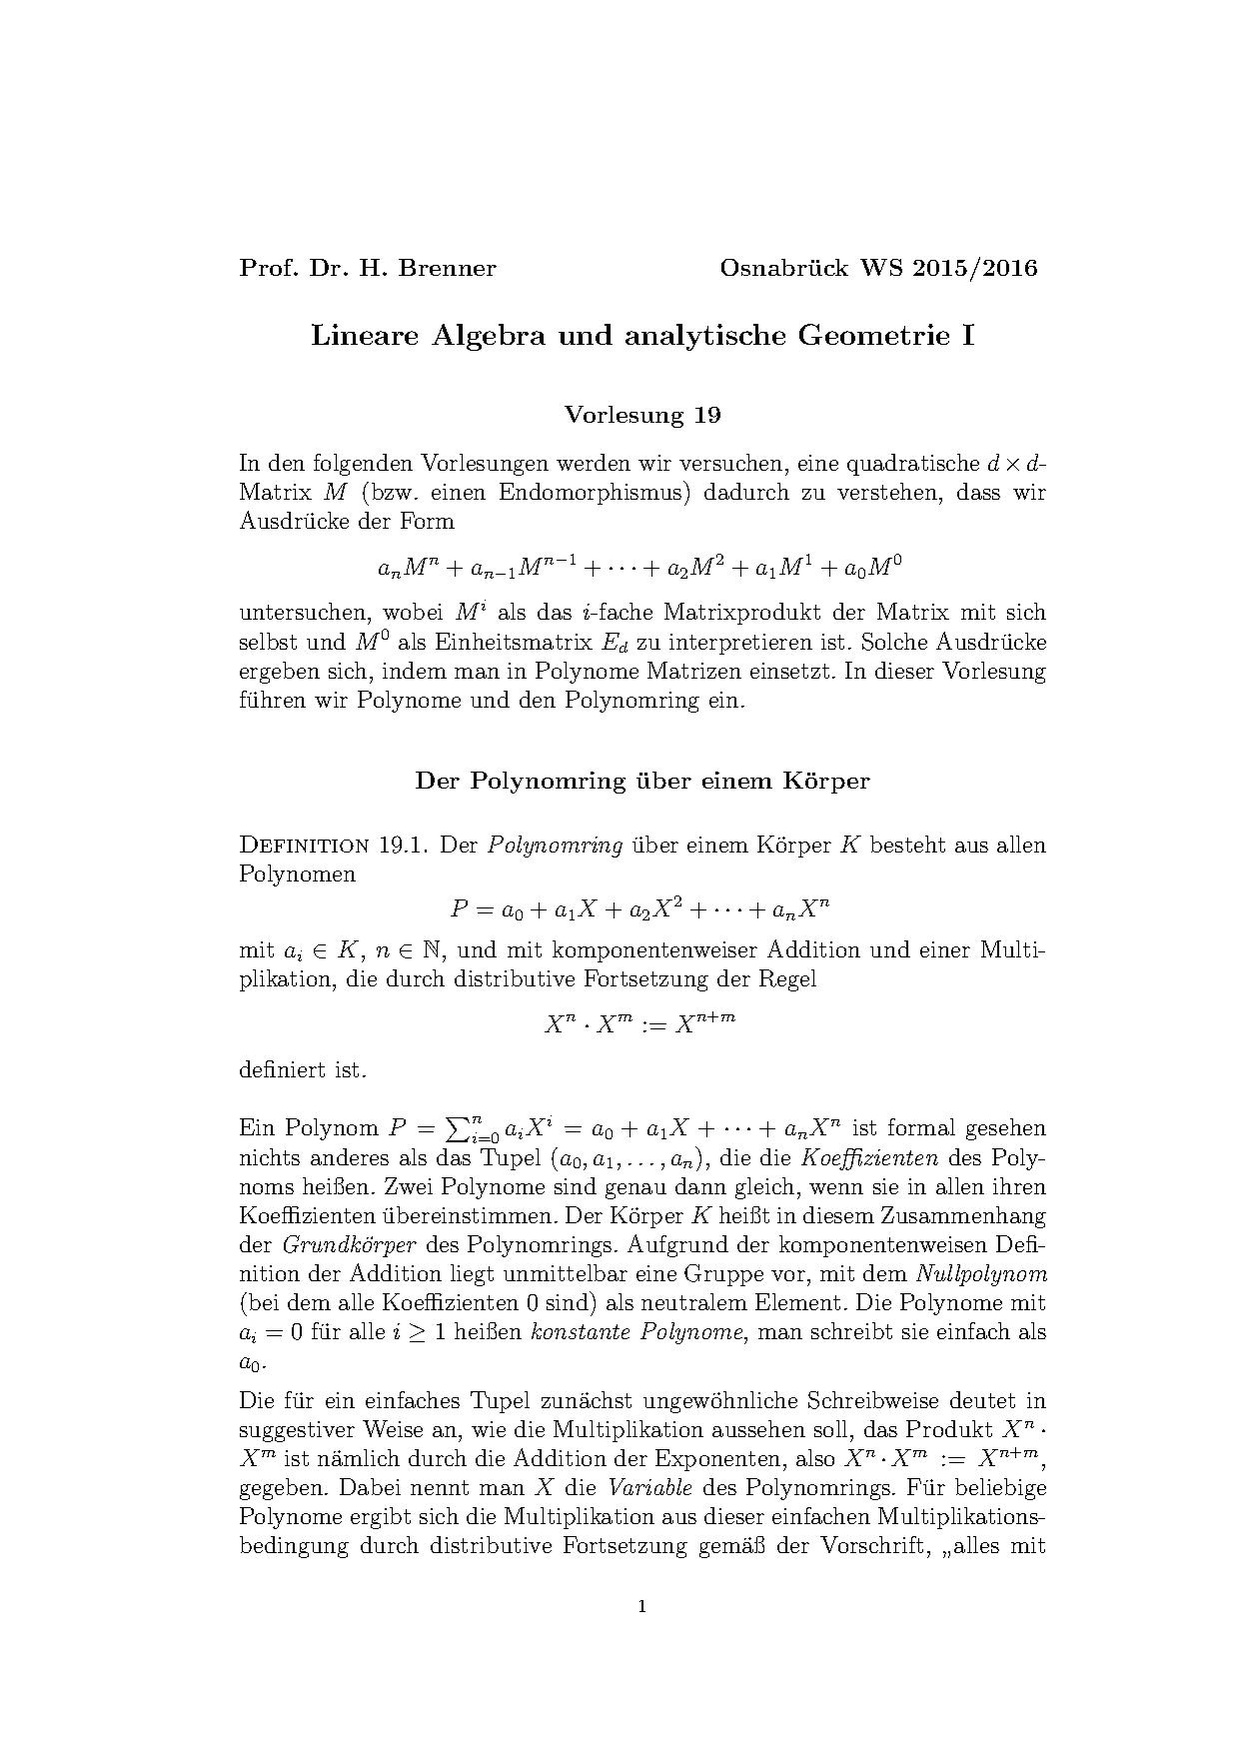 File:Lineare Algebra (Osnabrück 2015-2016)Teil IVorlesung19.pdf ...